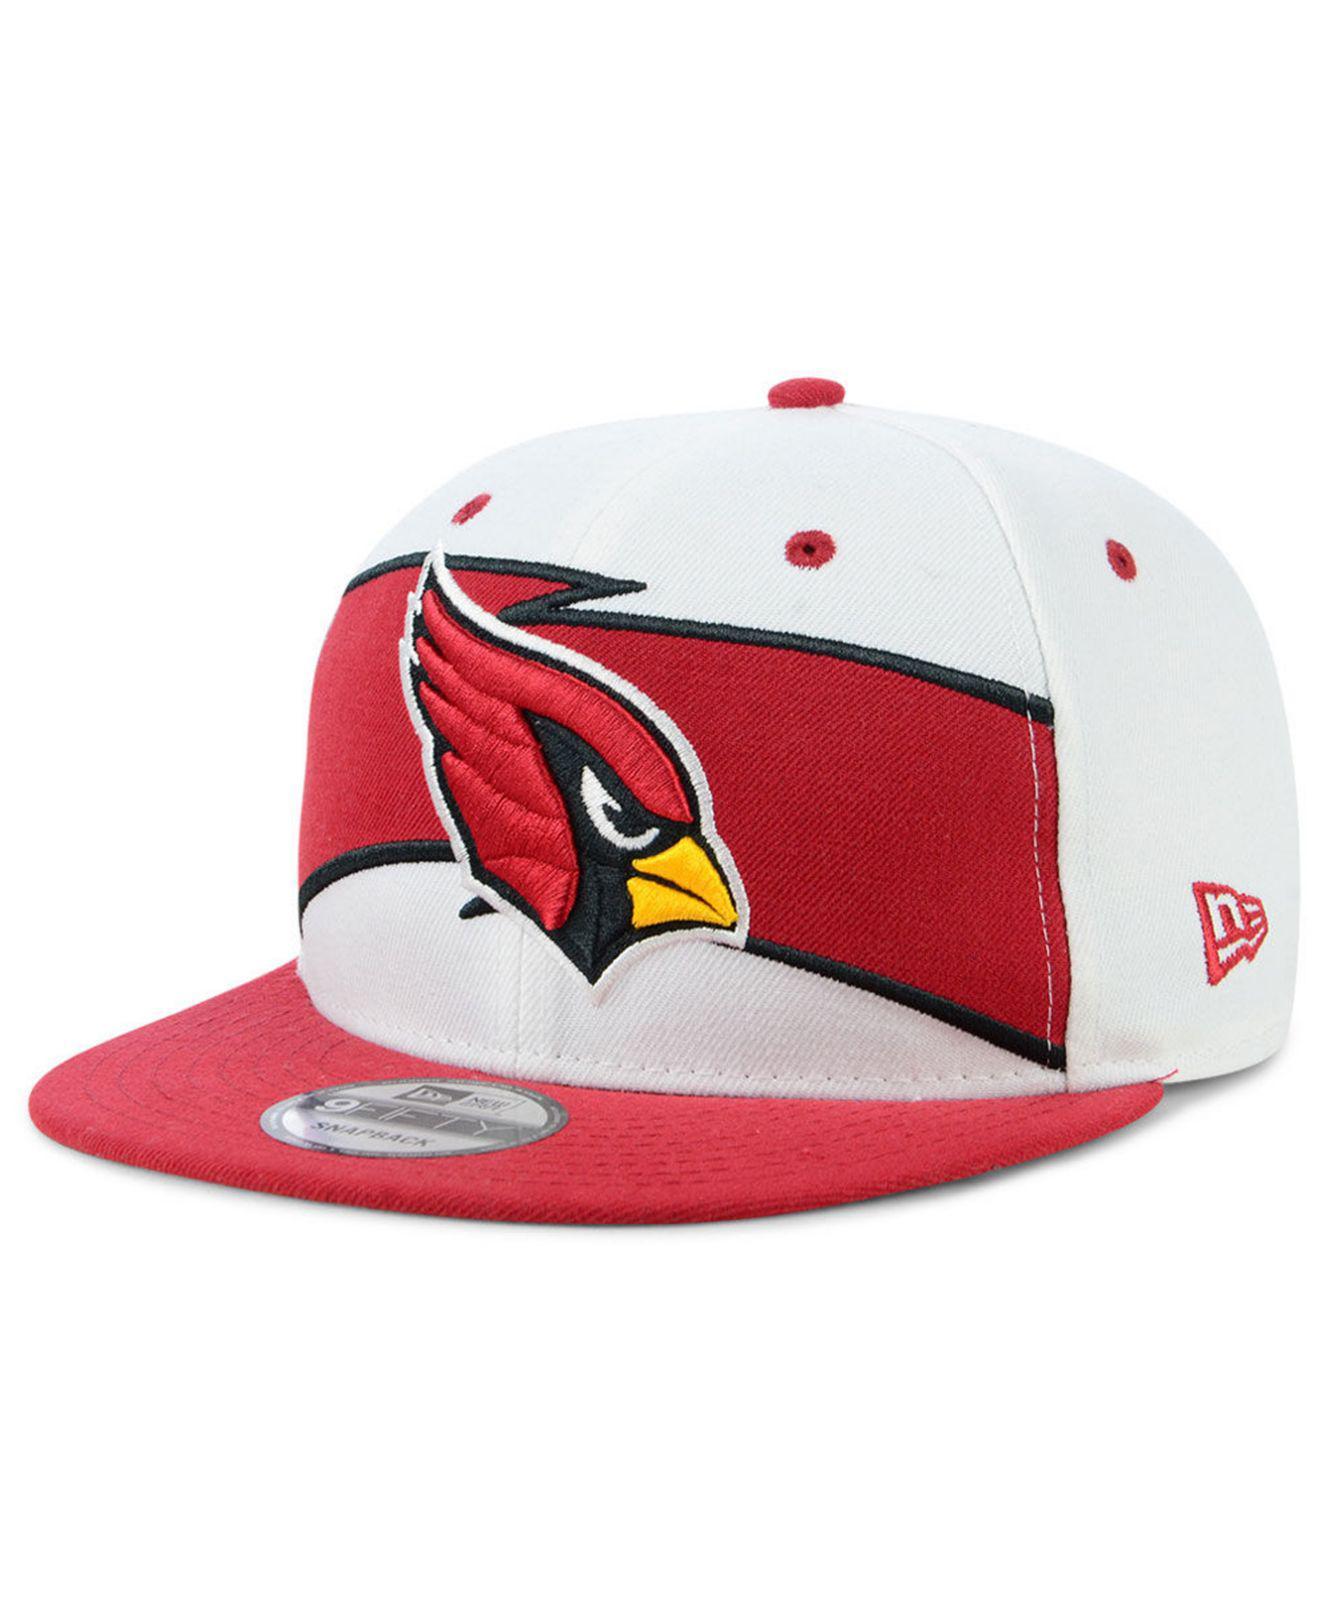 best service 5f27d 5ef2c Lyst - KTZ Arizona Cardinals Thanksgiving 9fifty Cap in White for Men